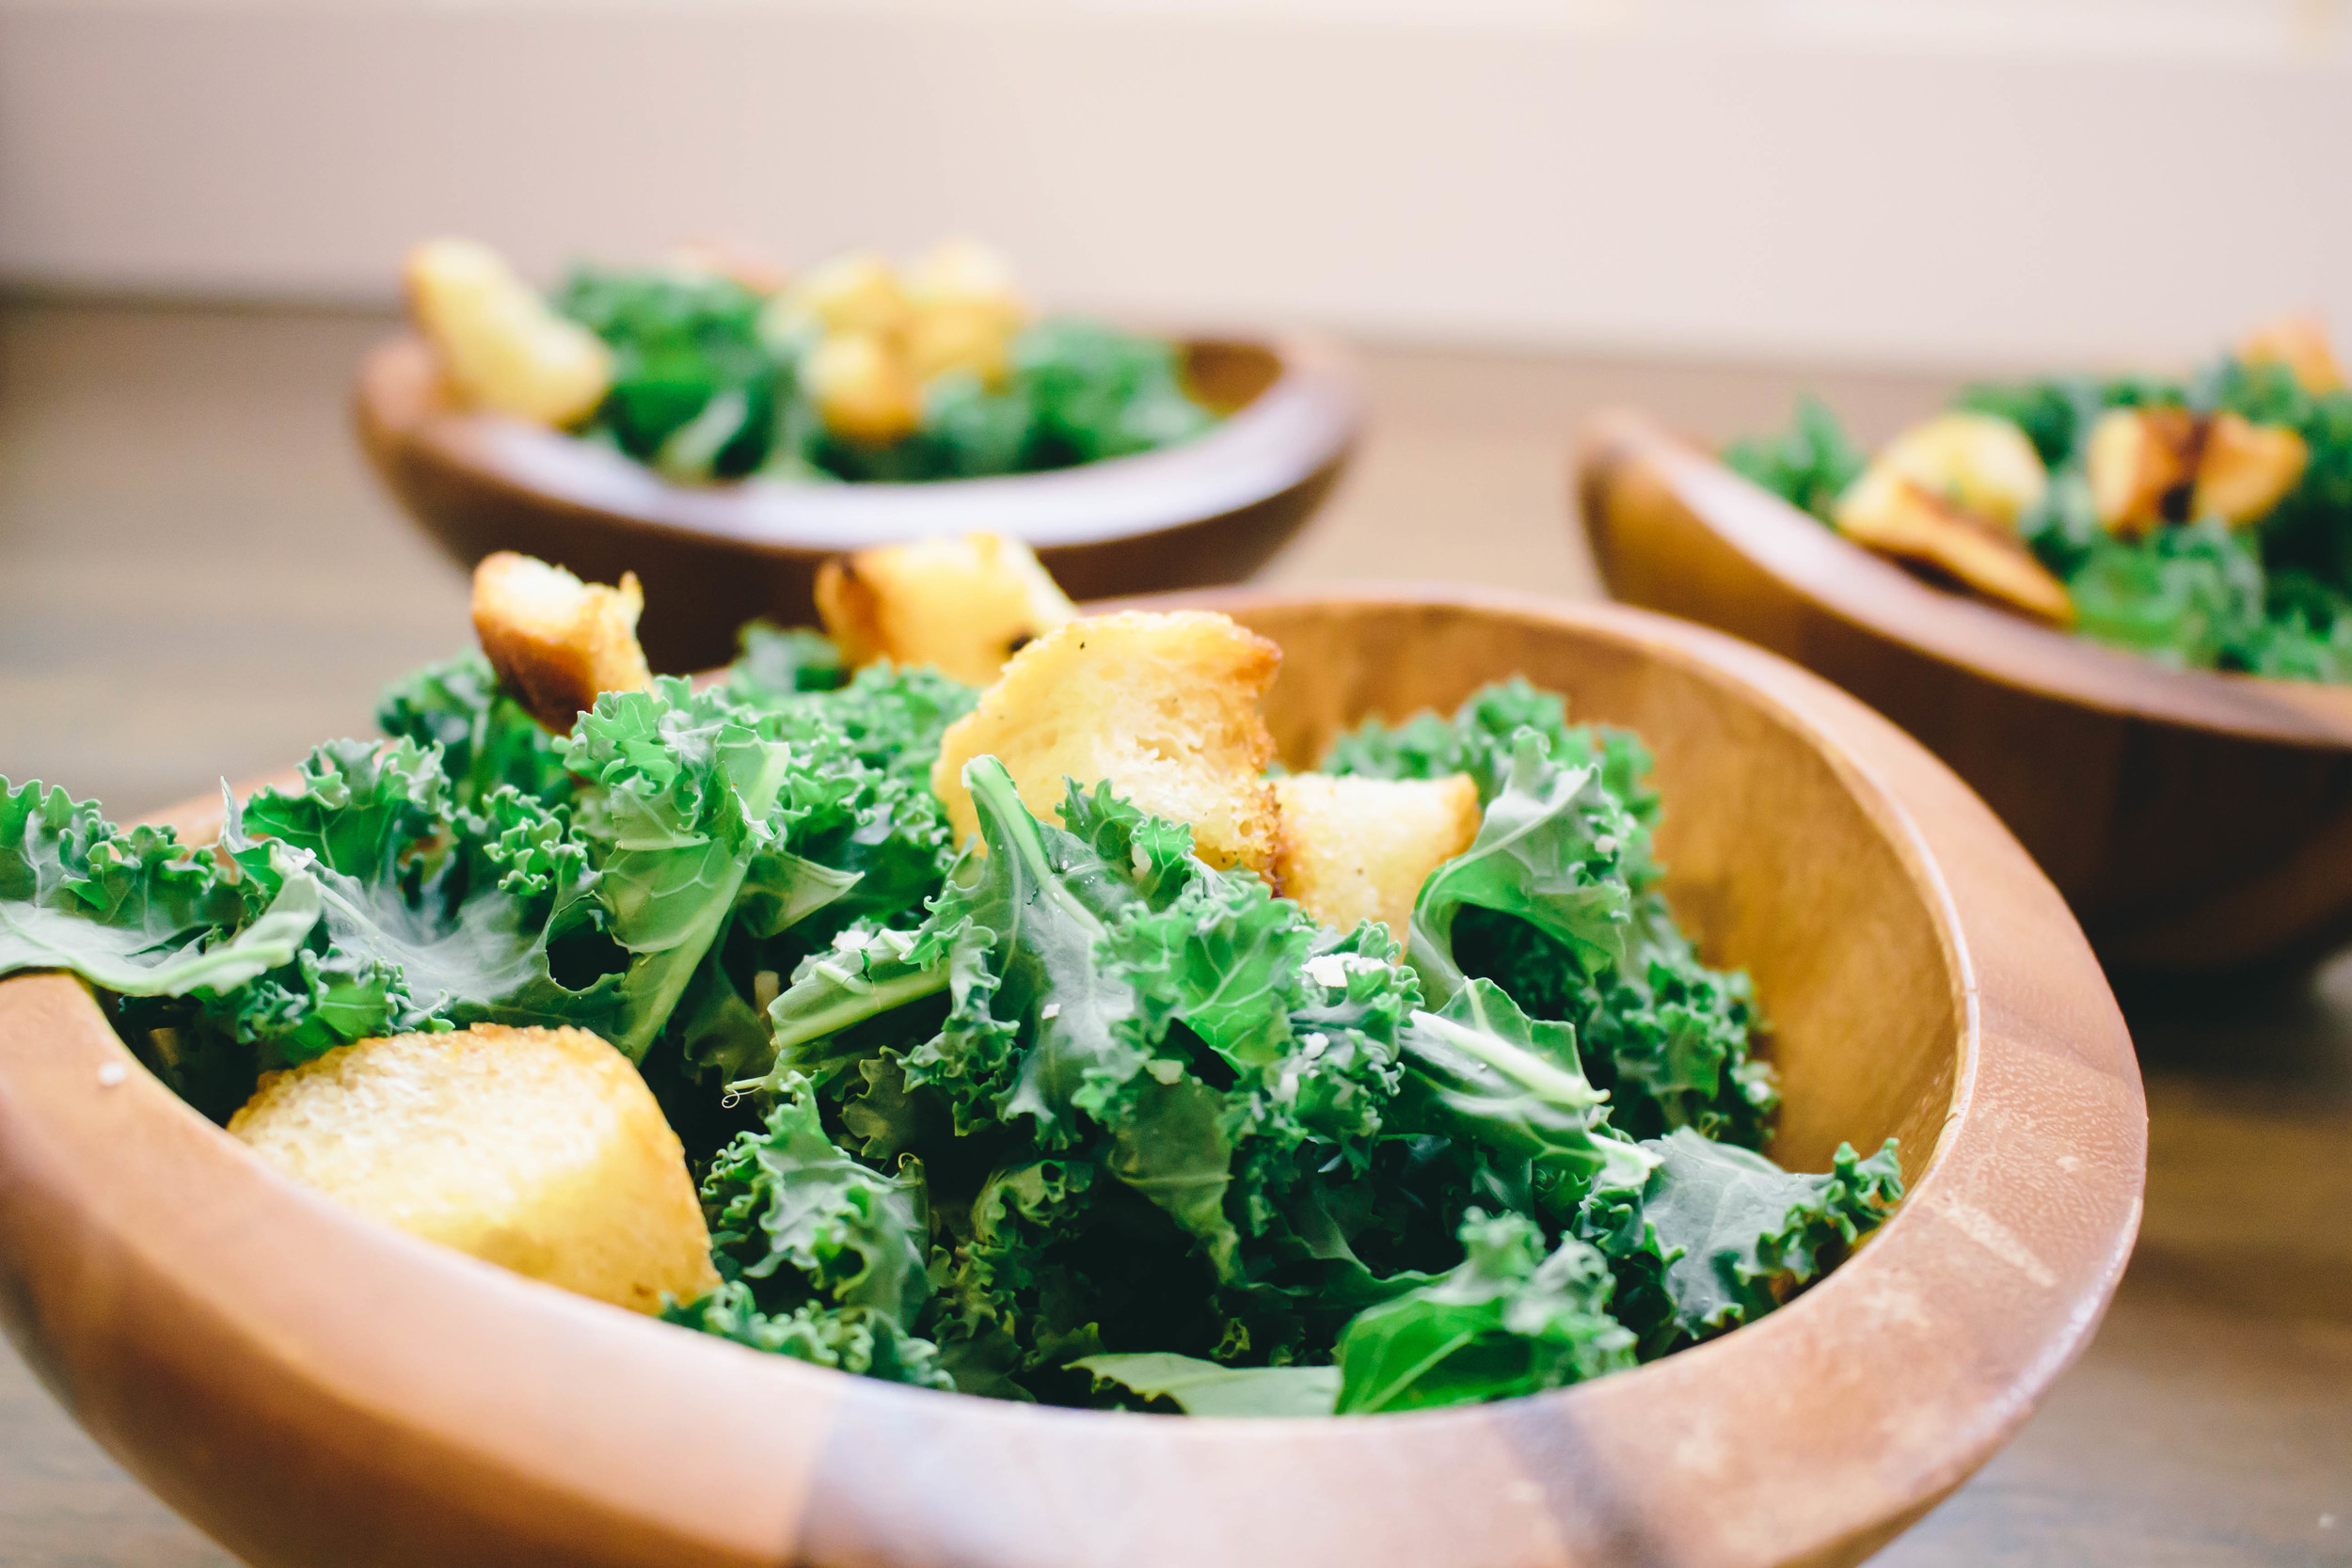 Kale caesar salad, dressed up caesar salad, how to use kale, kale, easy salad recipe, parmesan cheese, garlic cloves, italian bread,